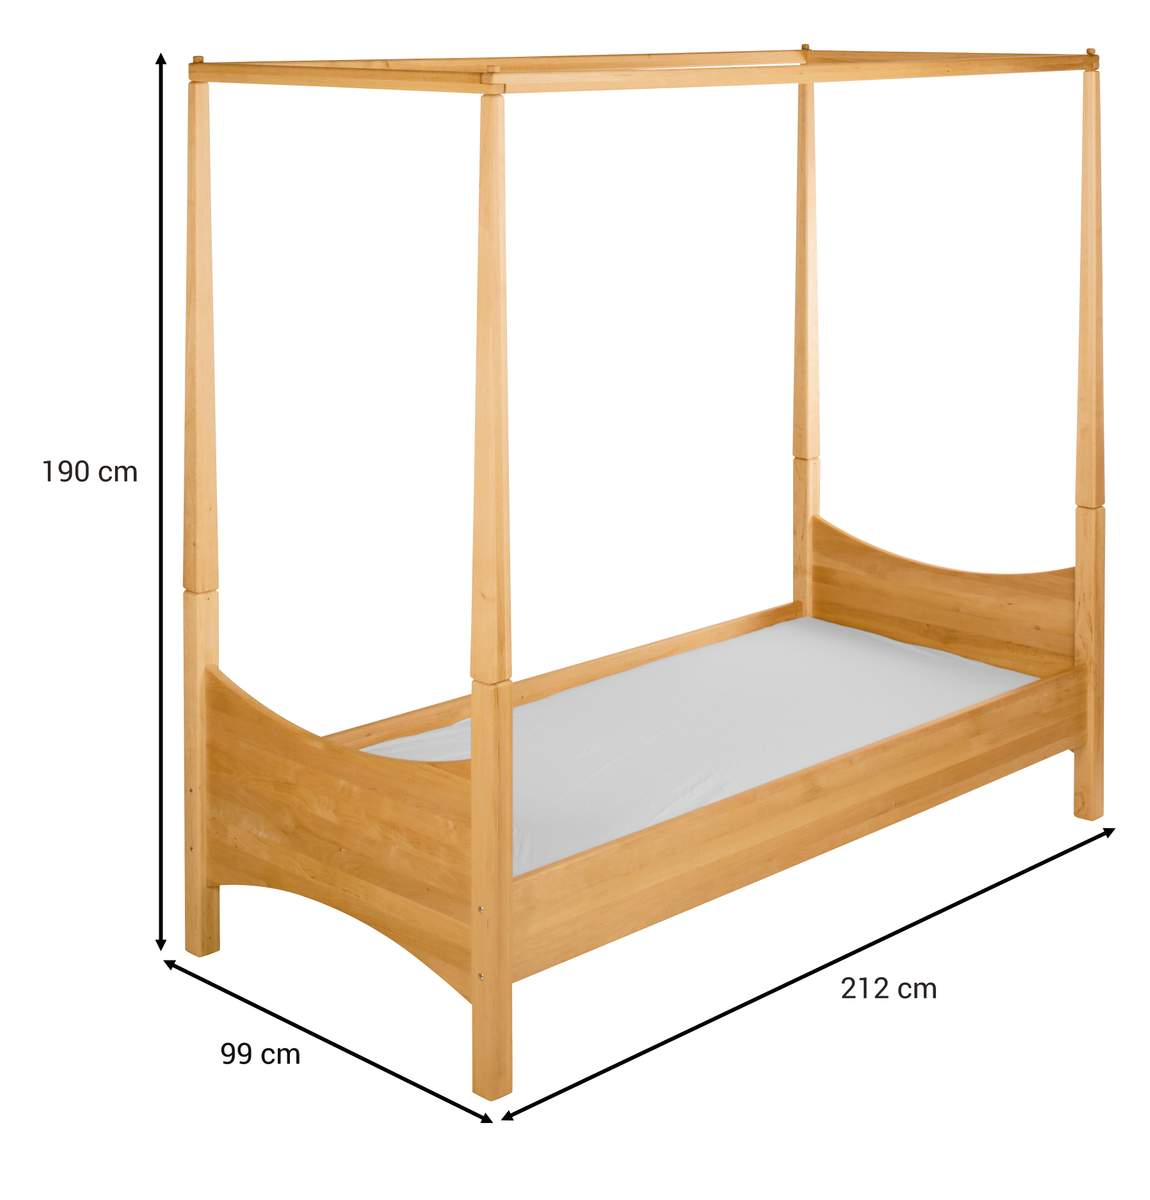 biokinder komplett set noah himmelbett kinderbett 90x200 cm erle. Black Bedroom Furniture Sets. Home Design Ideas